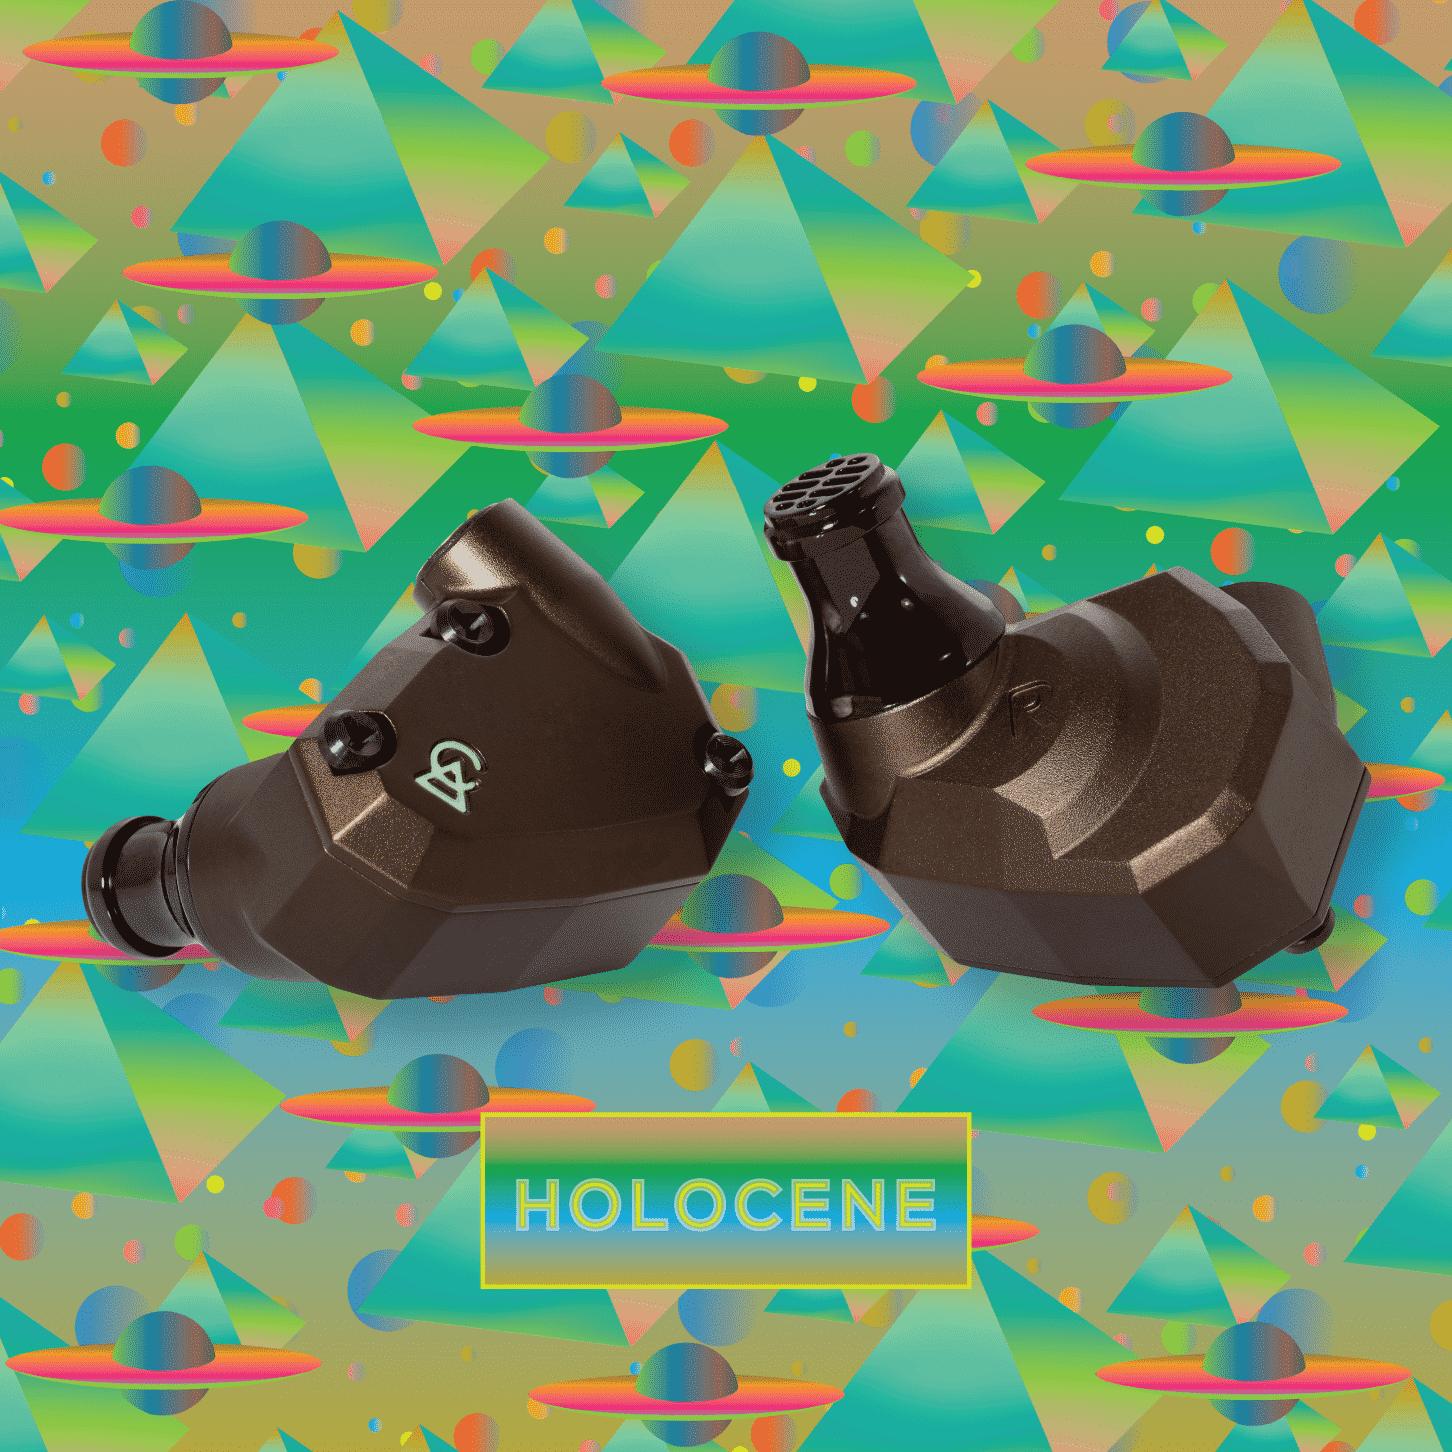 campfire audio holocene iem over epoch background